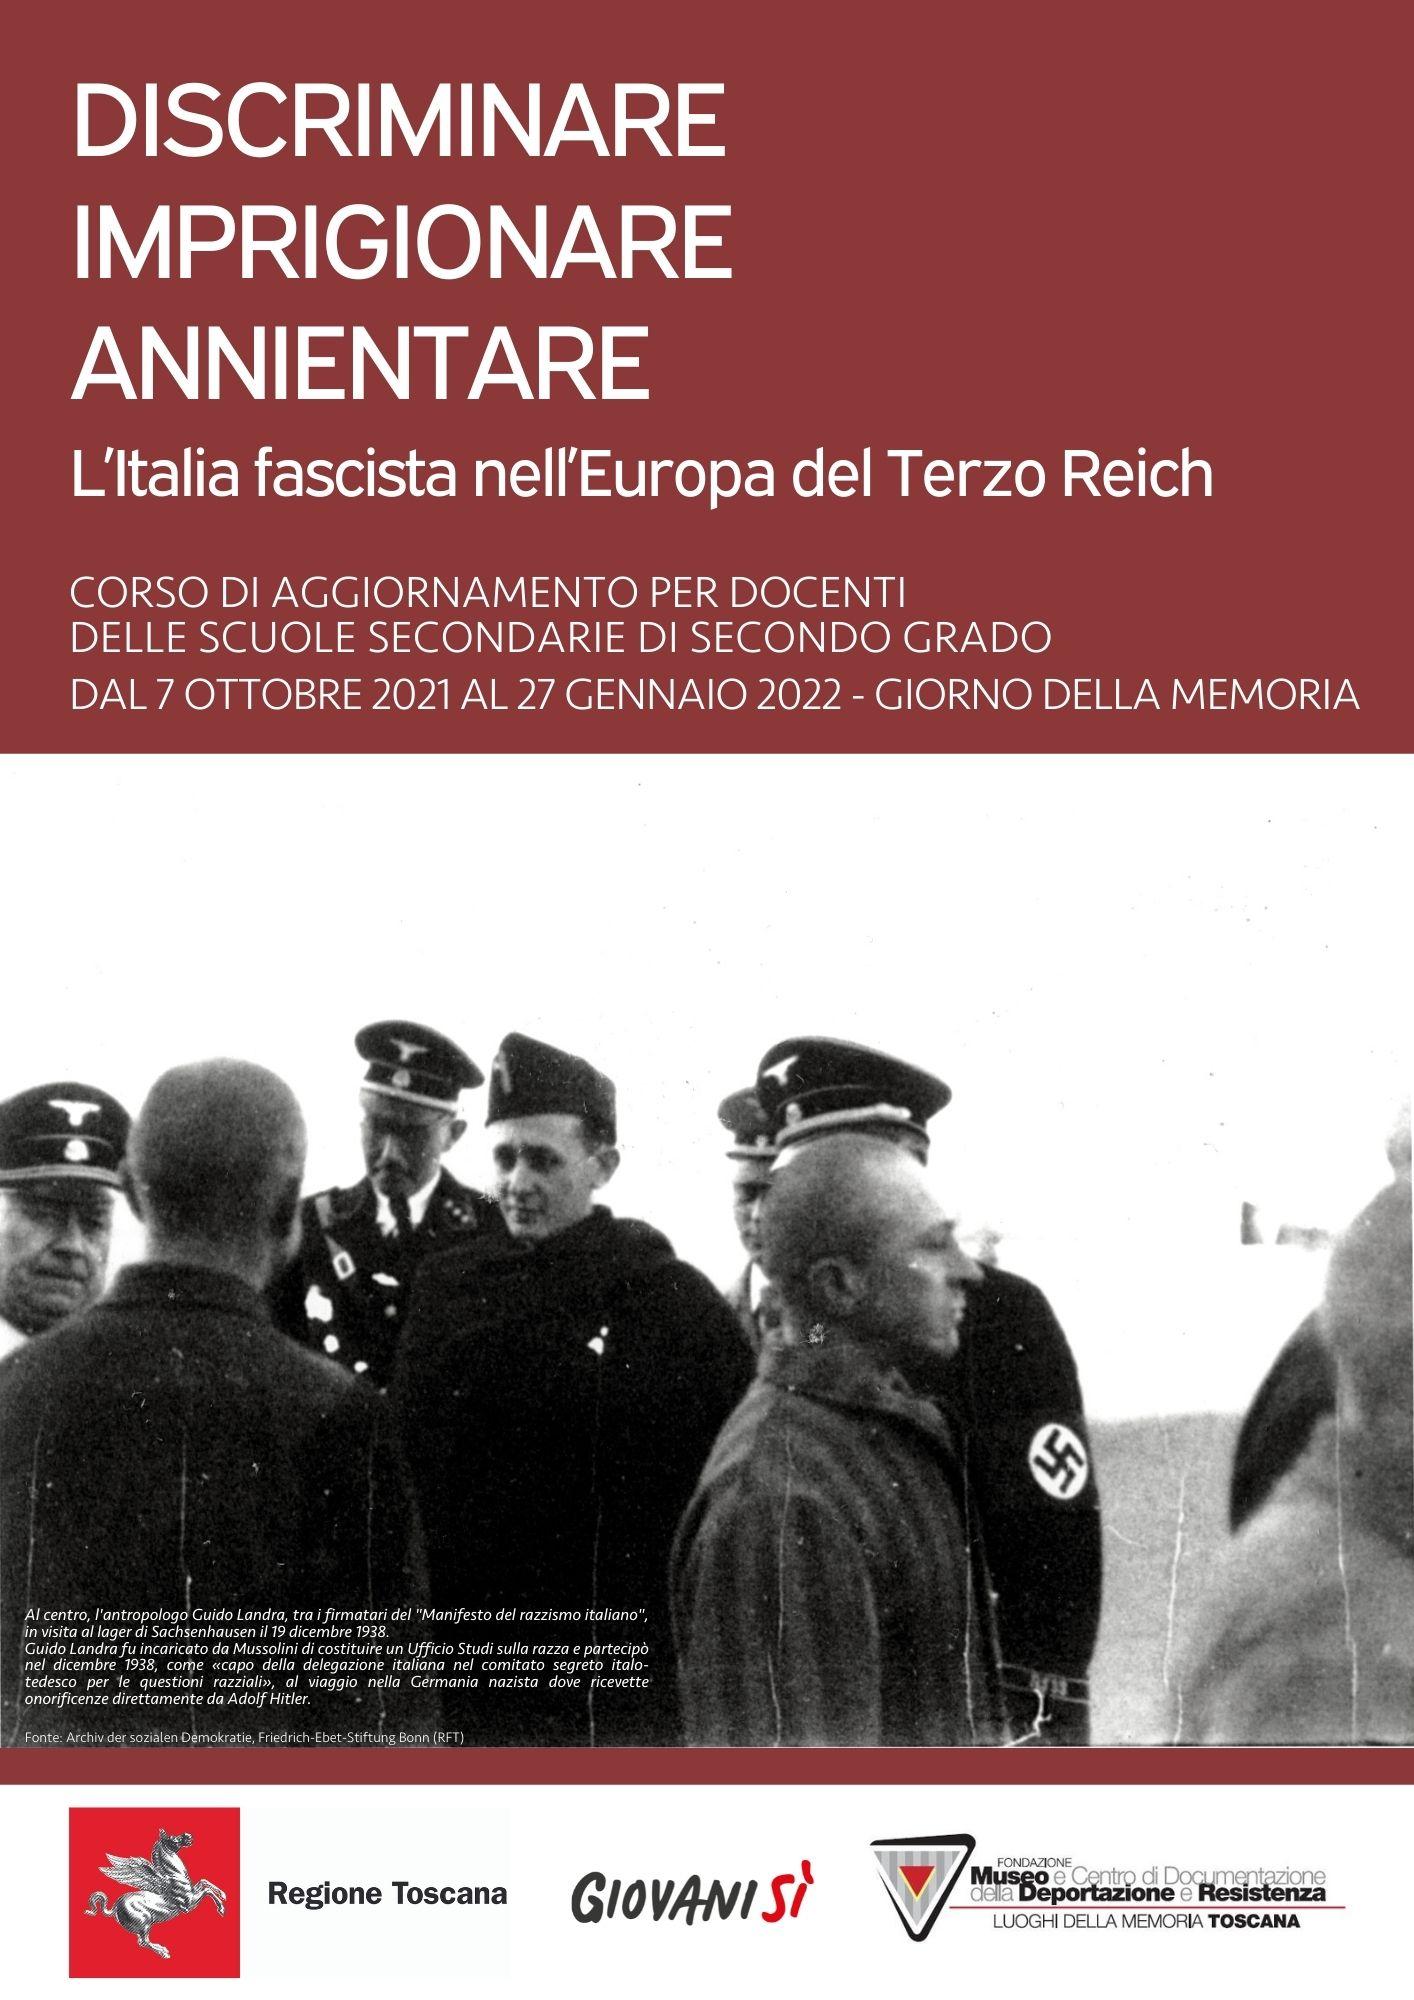 corso-fascismo_NUOVA-VERSIONE-3-senza-usrt